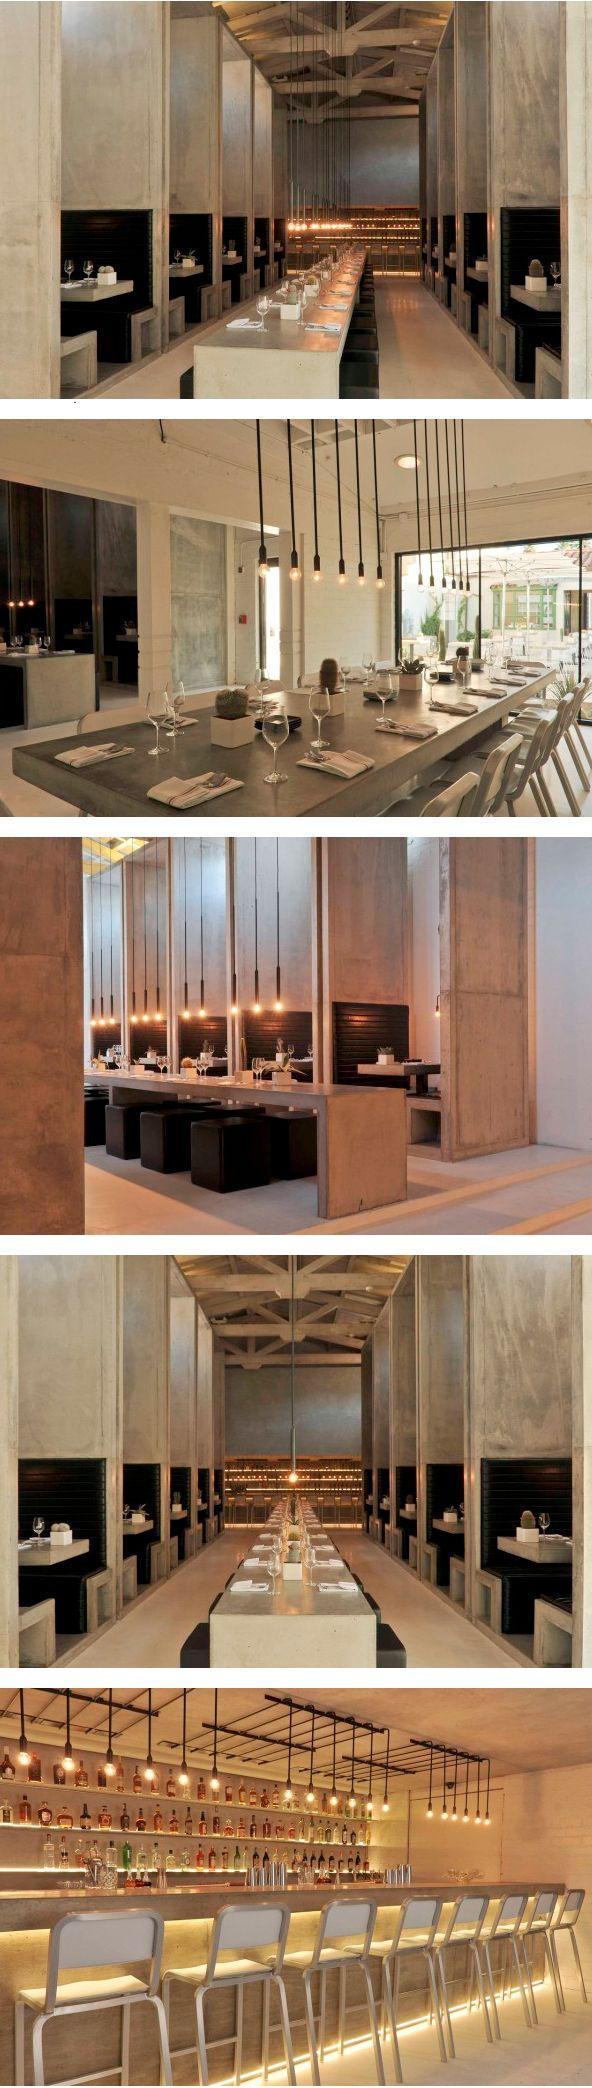 Restaurant Kitchen Bar Design 15 best bar design images on pinterest | bar designs, bar ideas